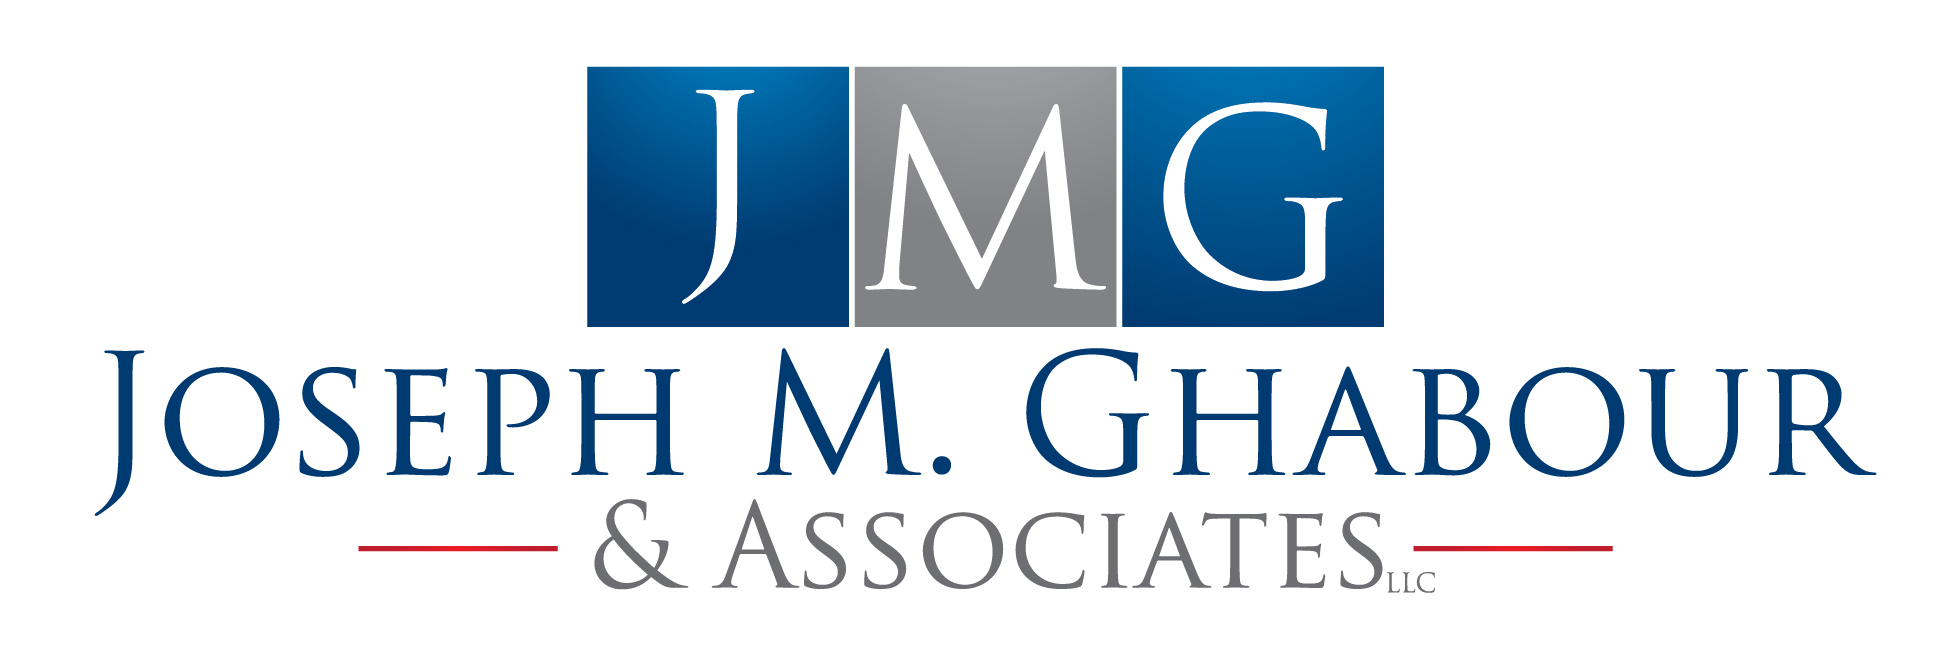 Joseph M. Ghabour & Associates, LLC - ad image